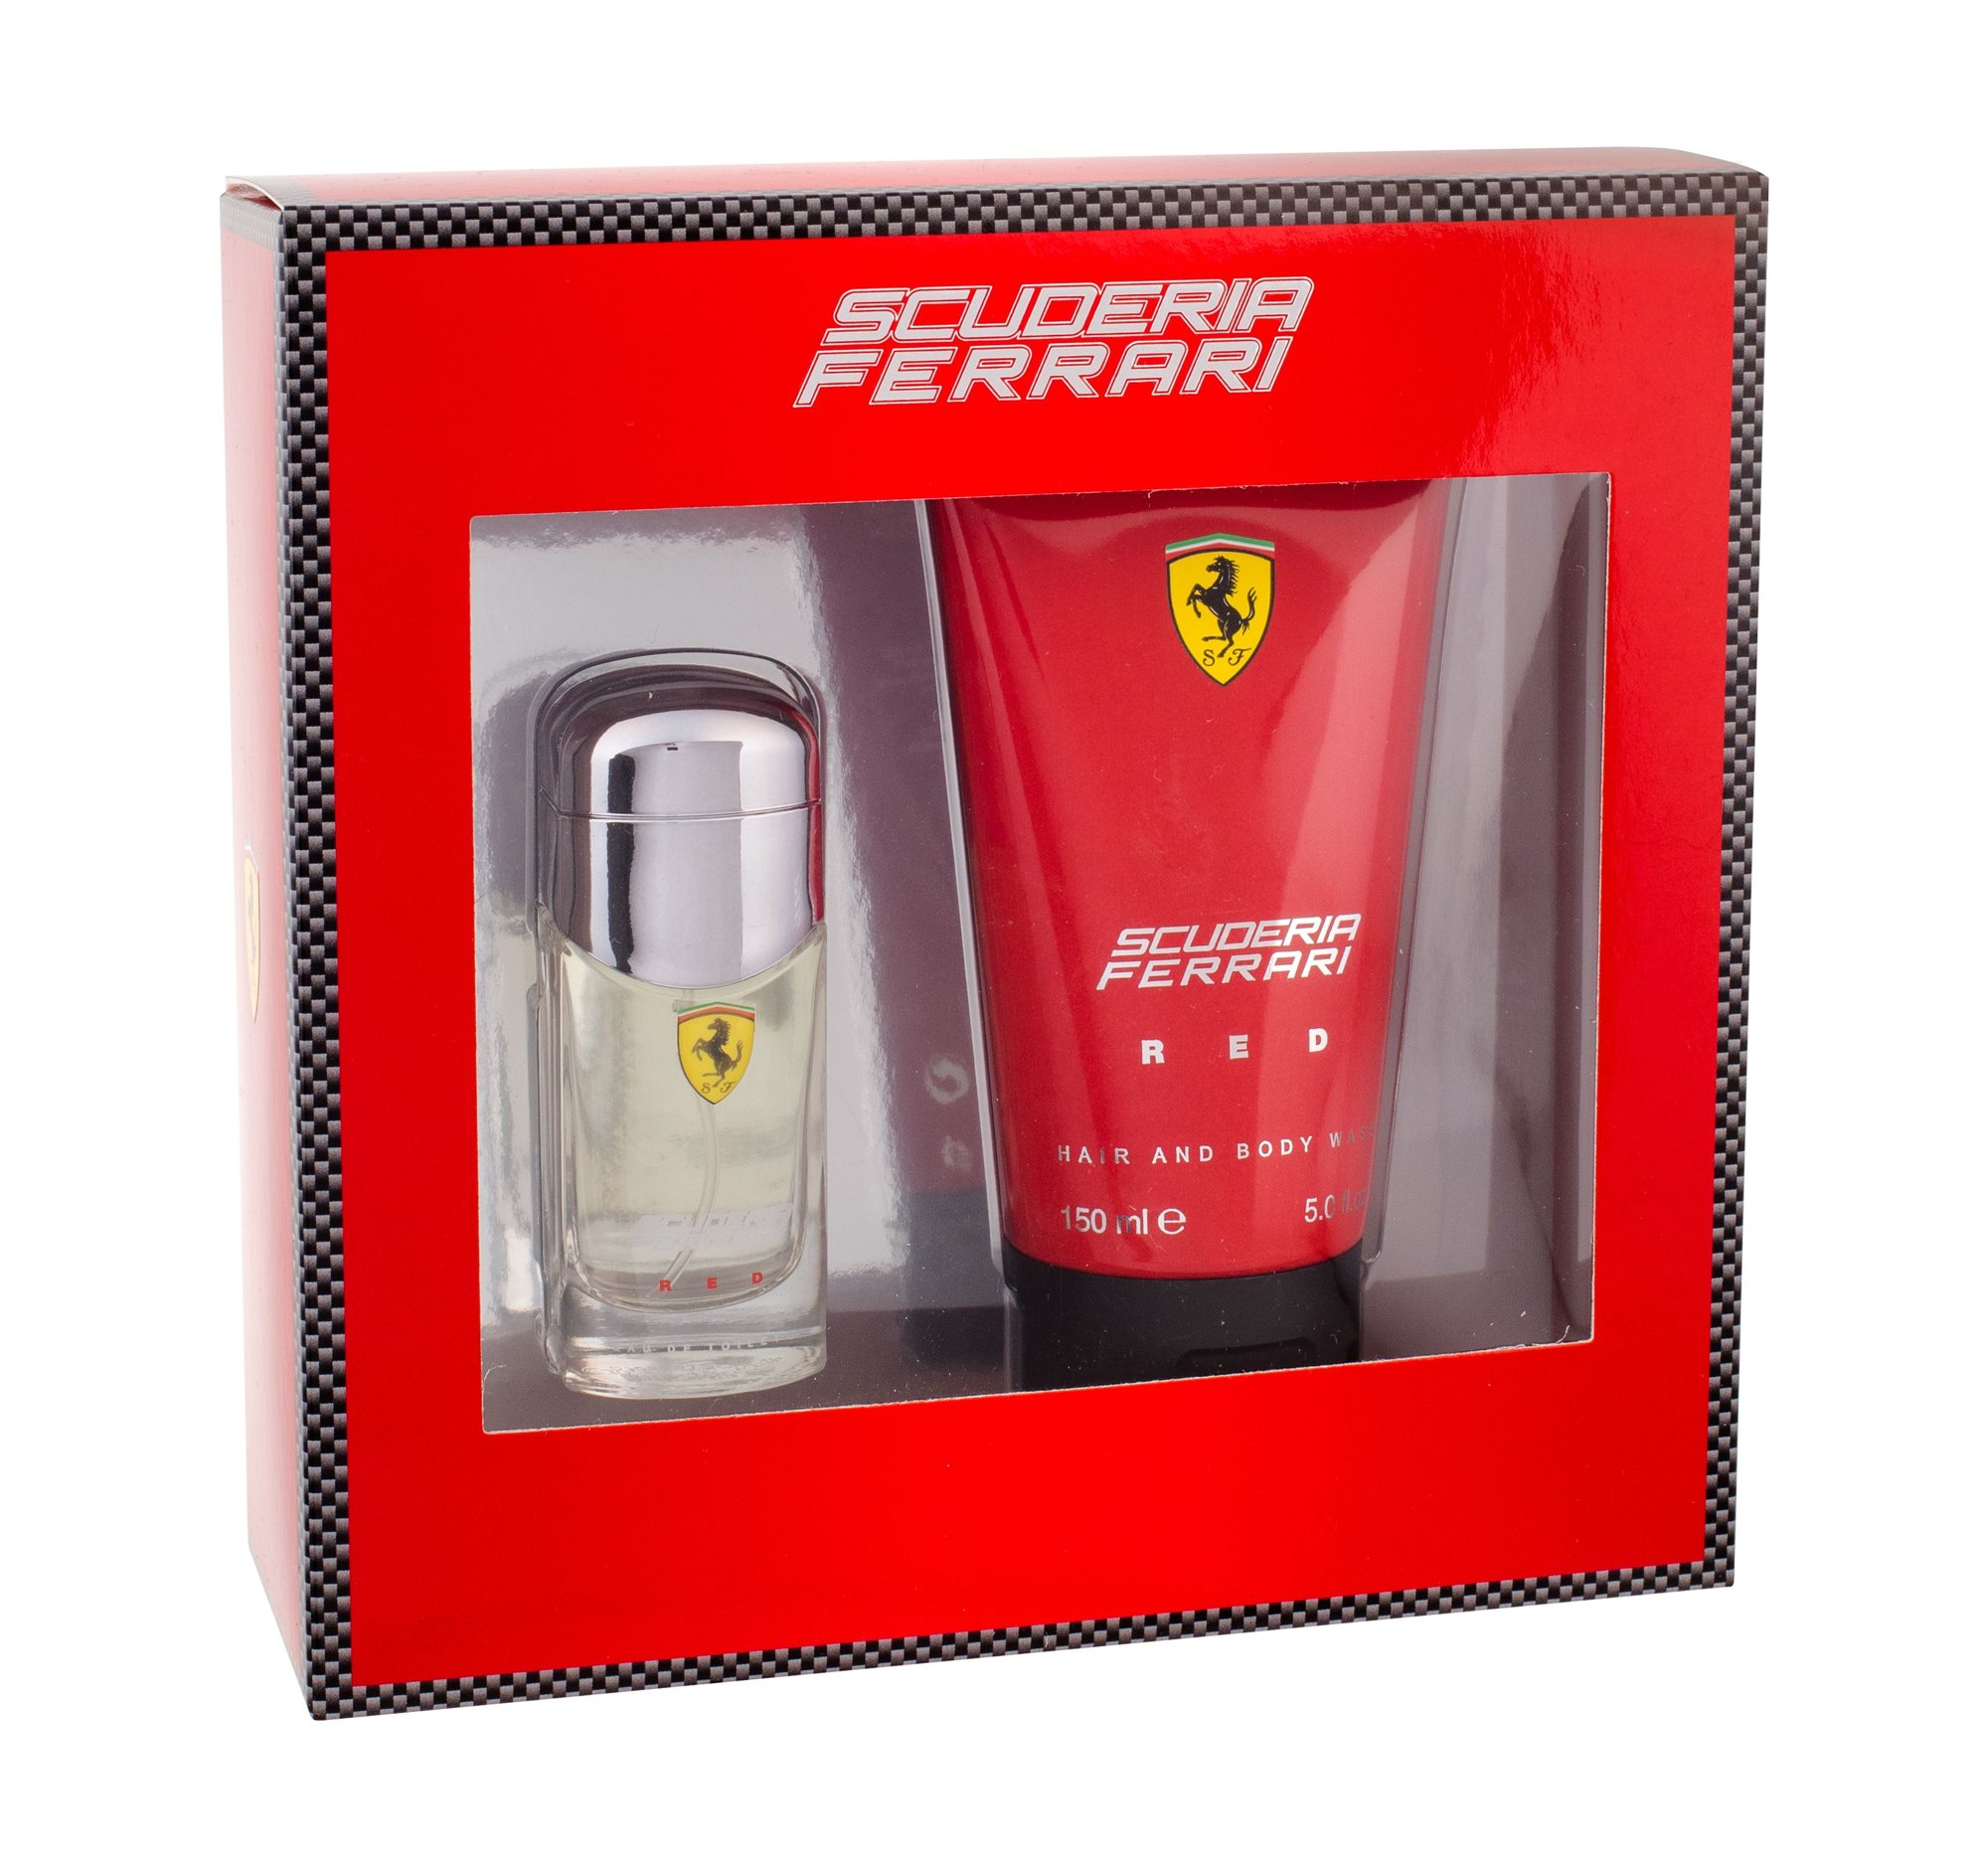 Ferrari Scuderia Ferrari Red EDT 30ml